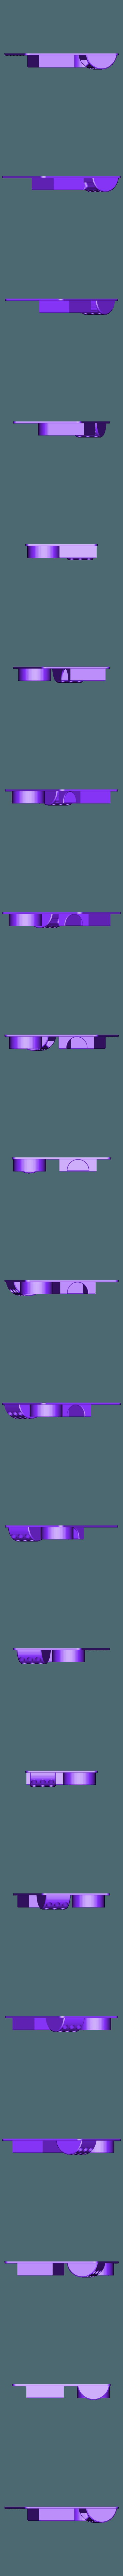 set de bureau à personnaliser.stl Download STL file Desktop set to customize • 3D print model, SergeResplandy